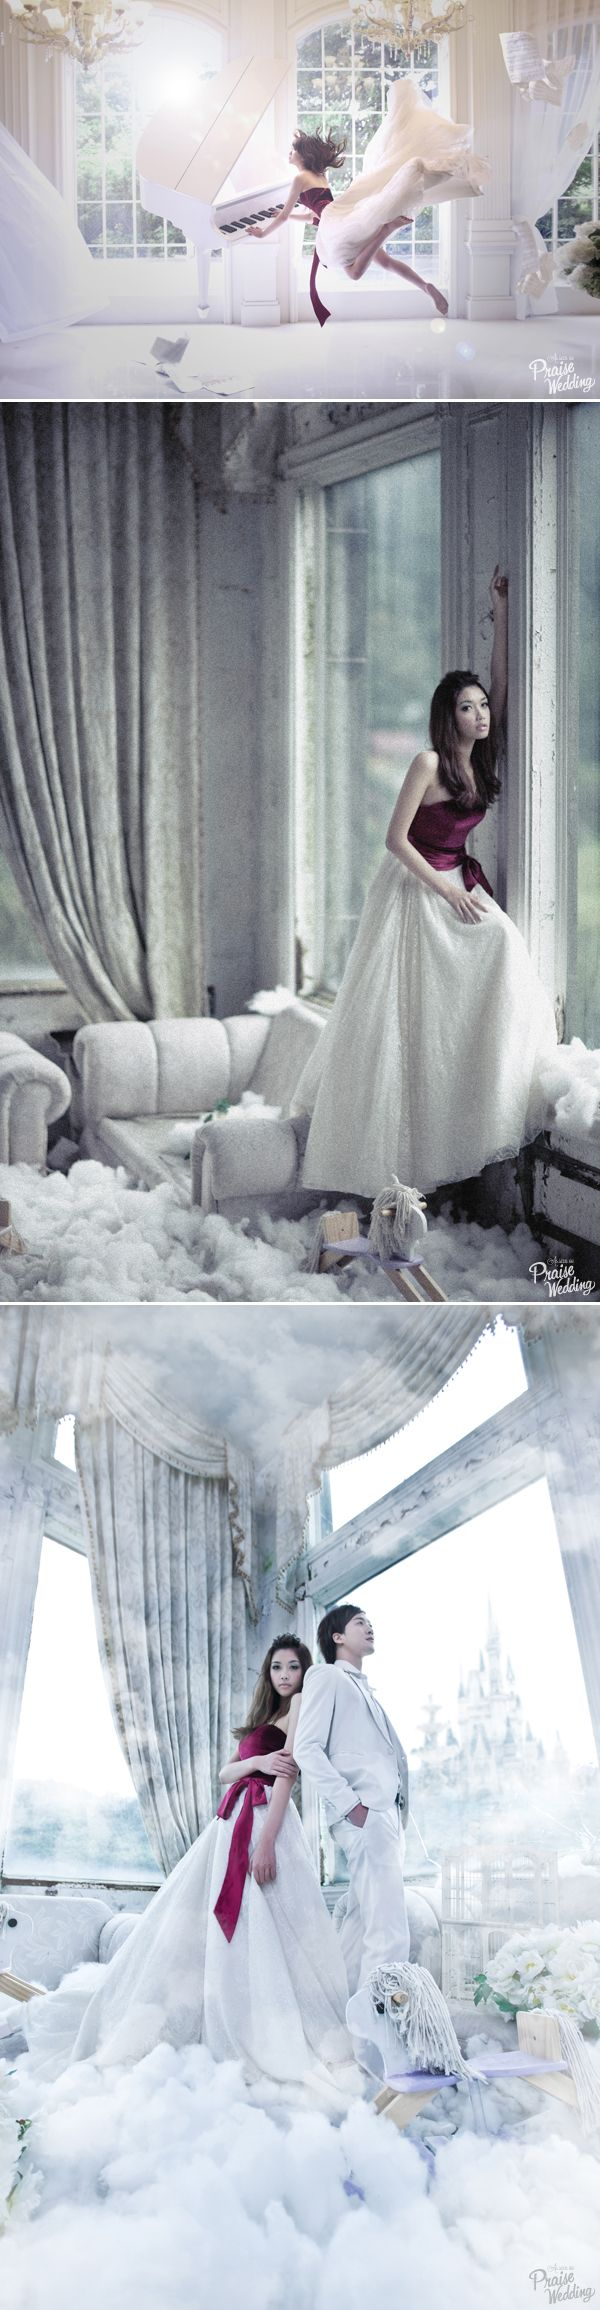 "Creating ""floating"" pre-wedding photo"